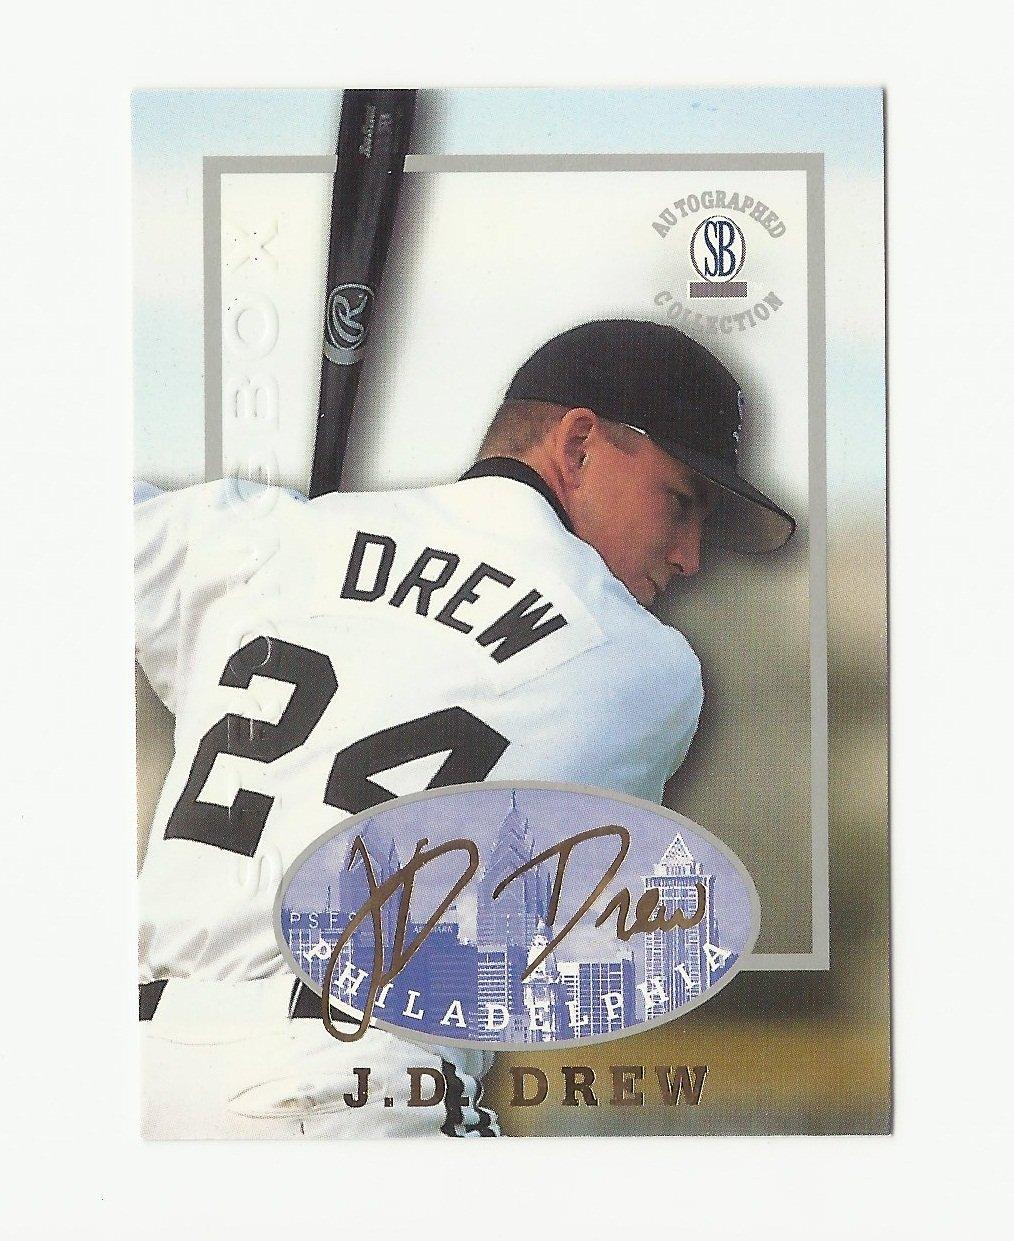 J.D. Drew 1997 The Score Board Strongbox Autographed Collection Card #3 Philadelphia Phillies